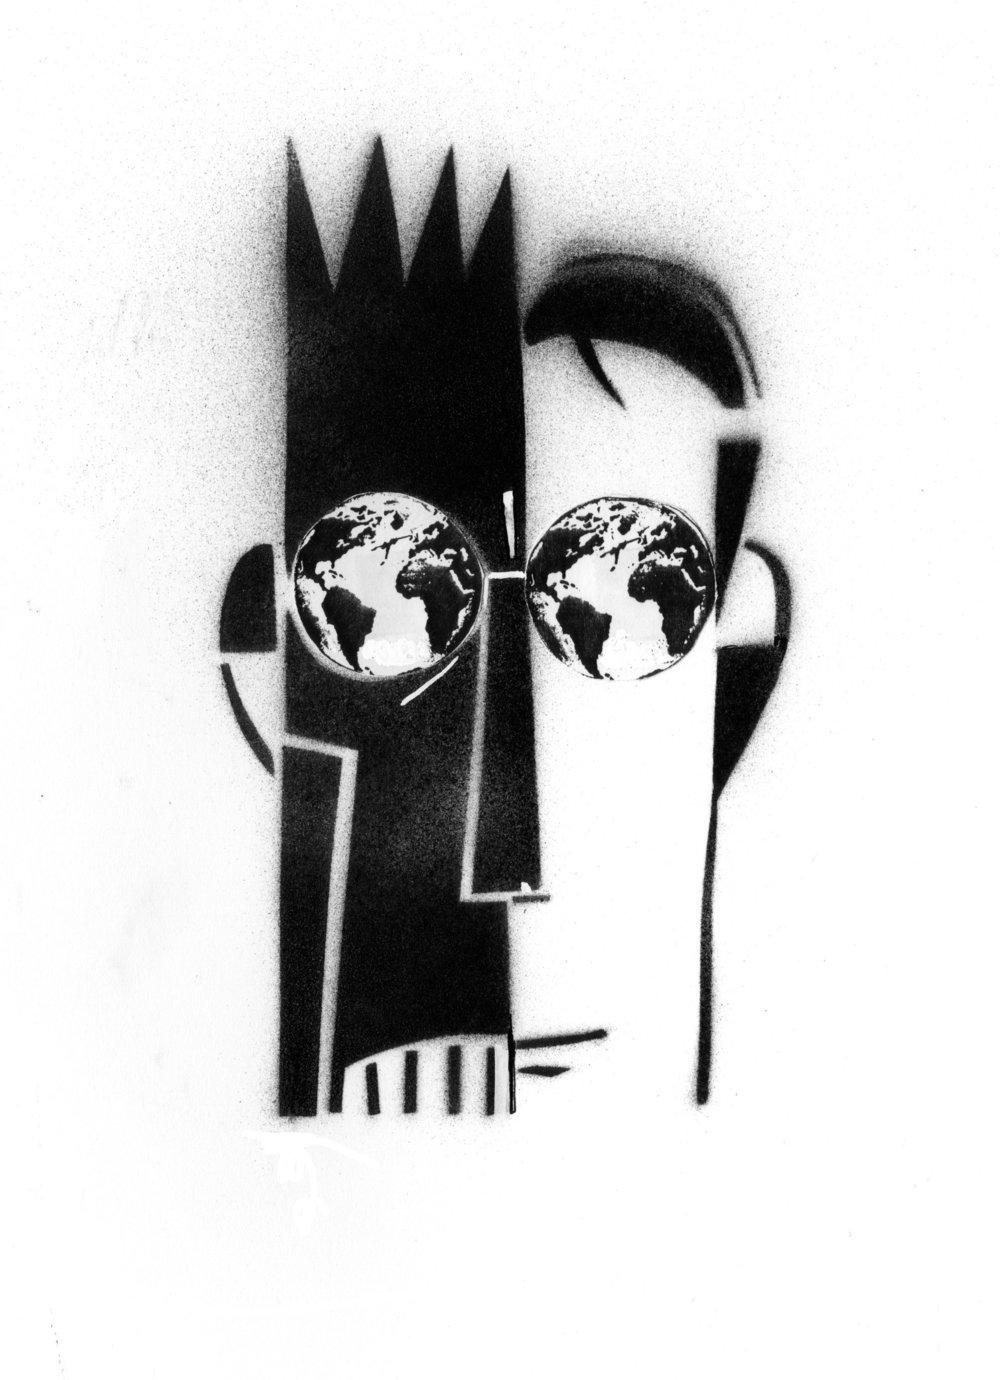 World #7